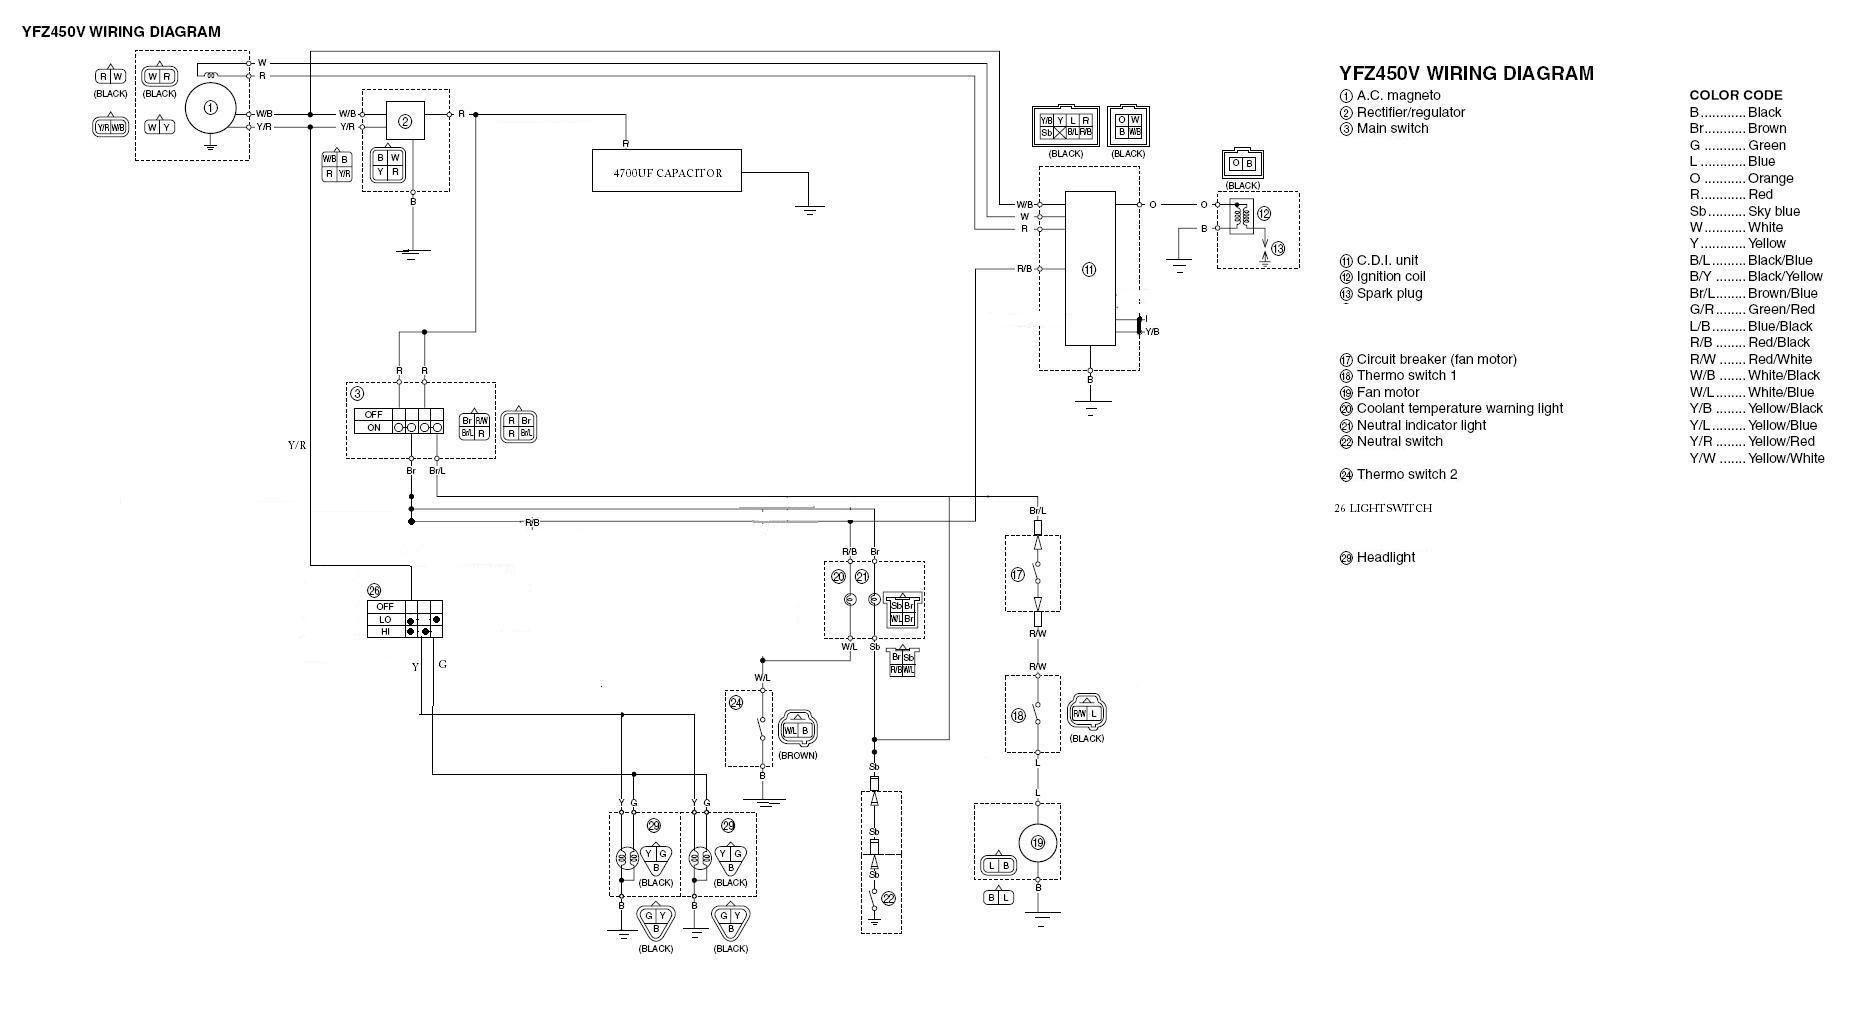 2004 Yfz 450 Wiring Diagram In 2021 Diagram Wire Altima